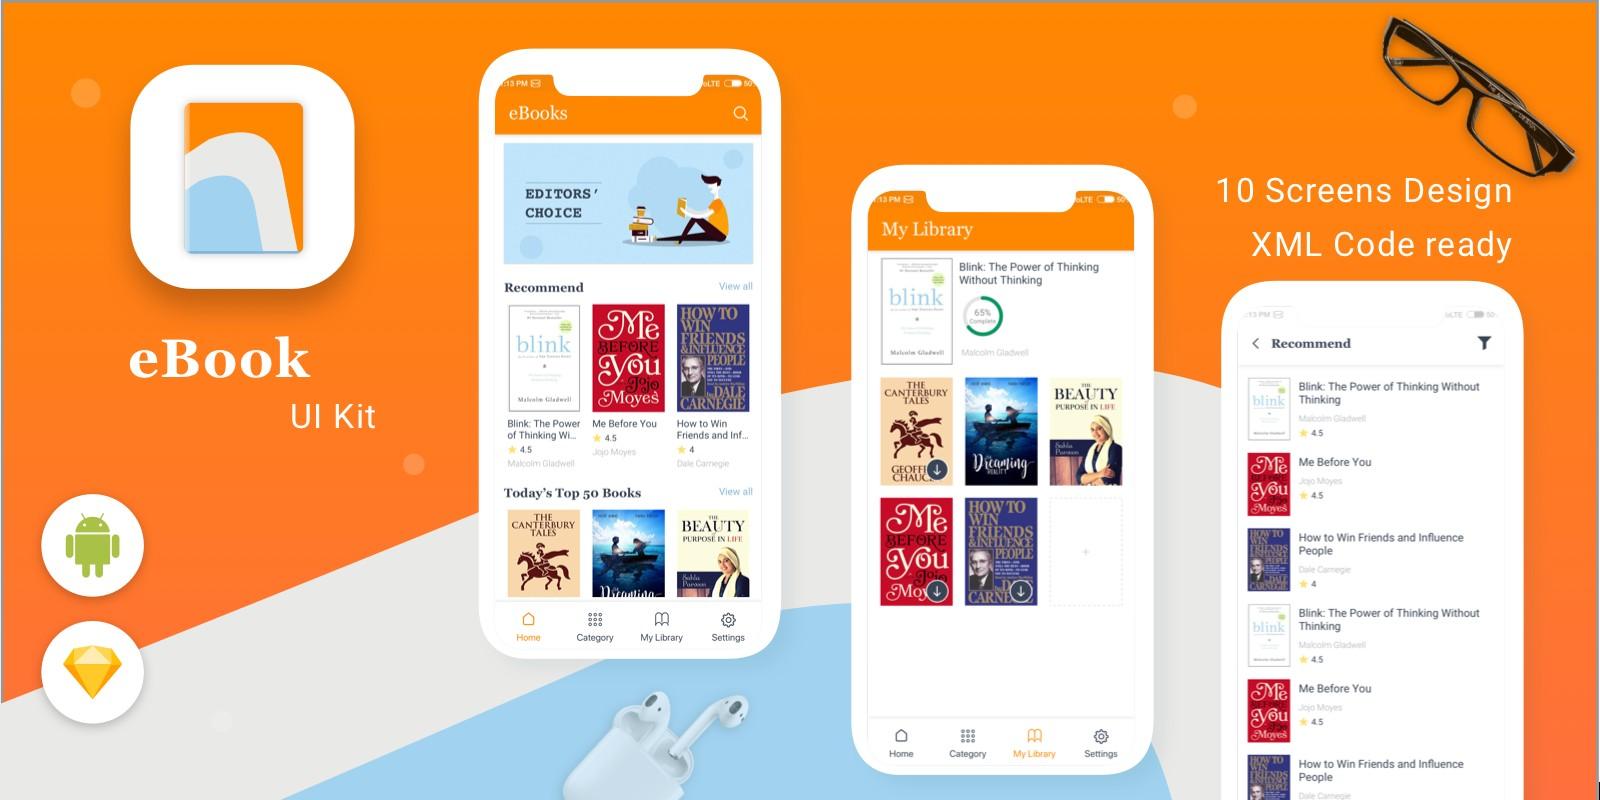 e-Book - Android Studio UI Kit